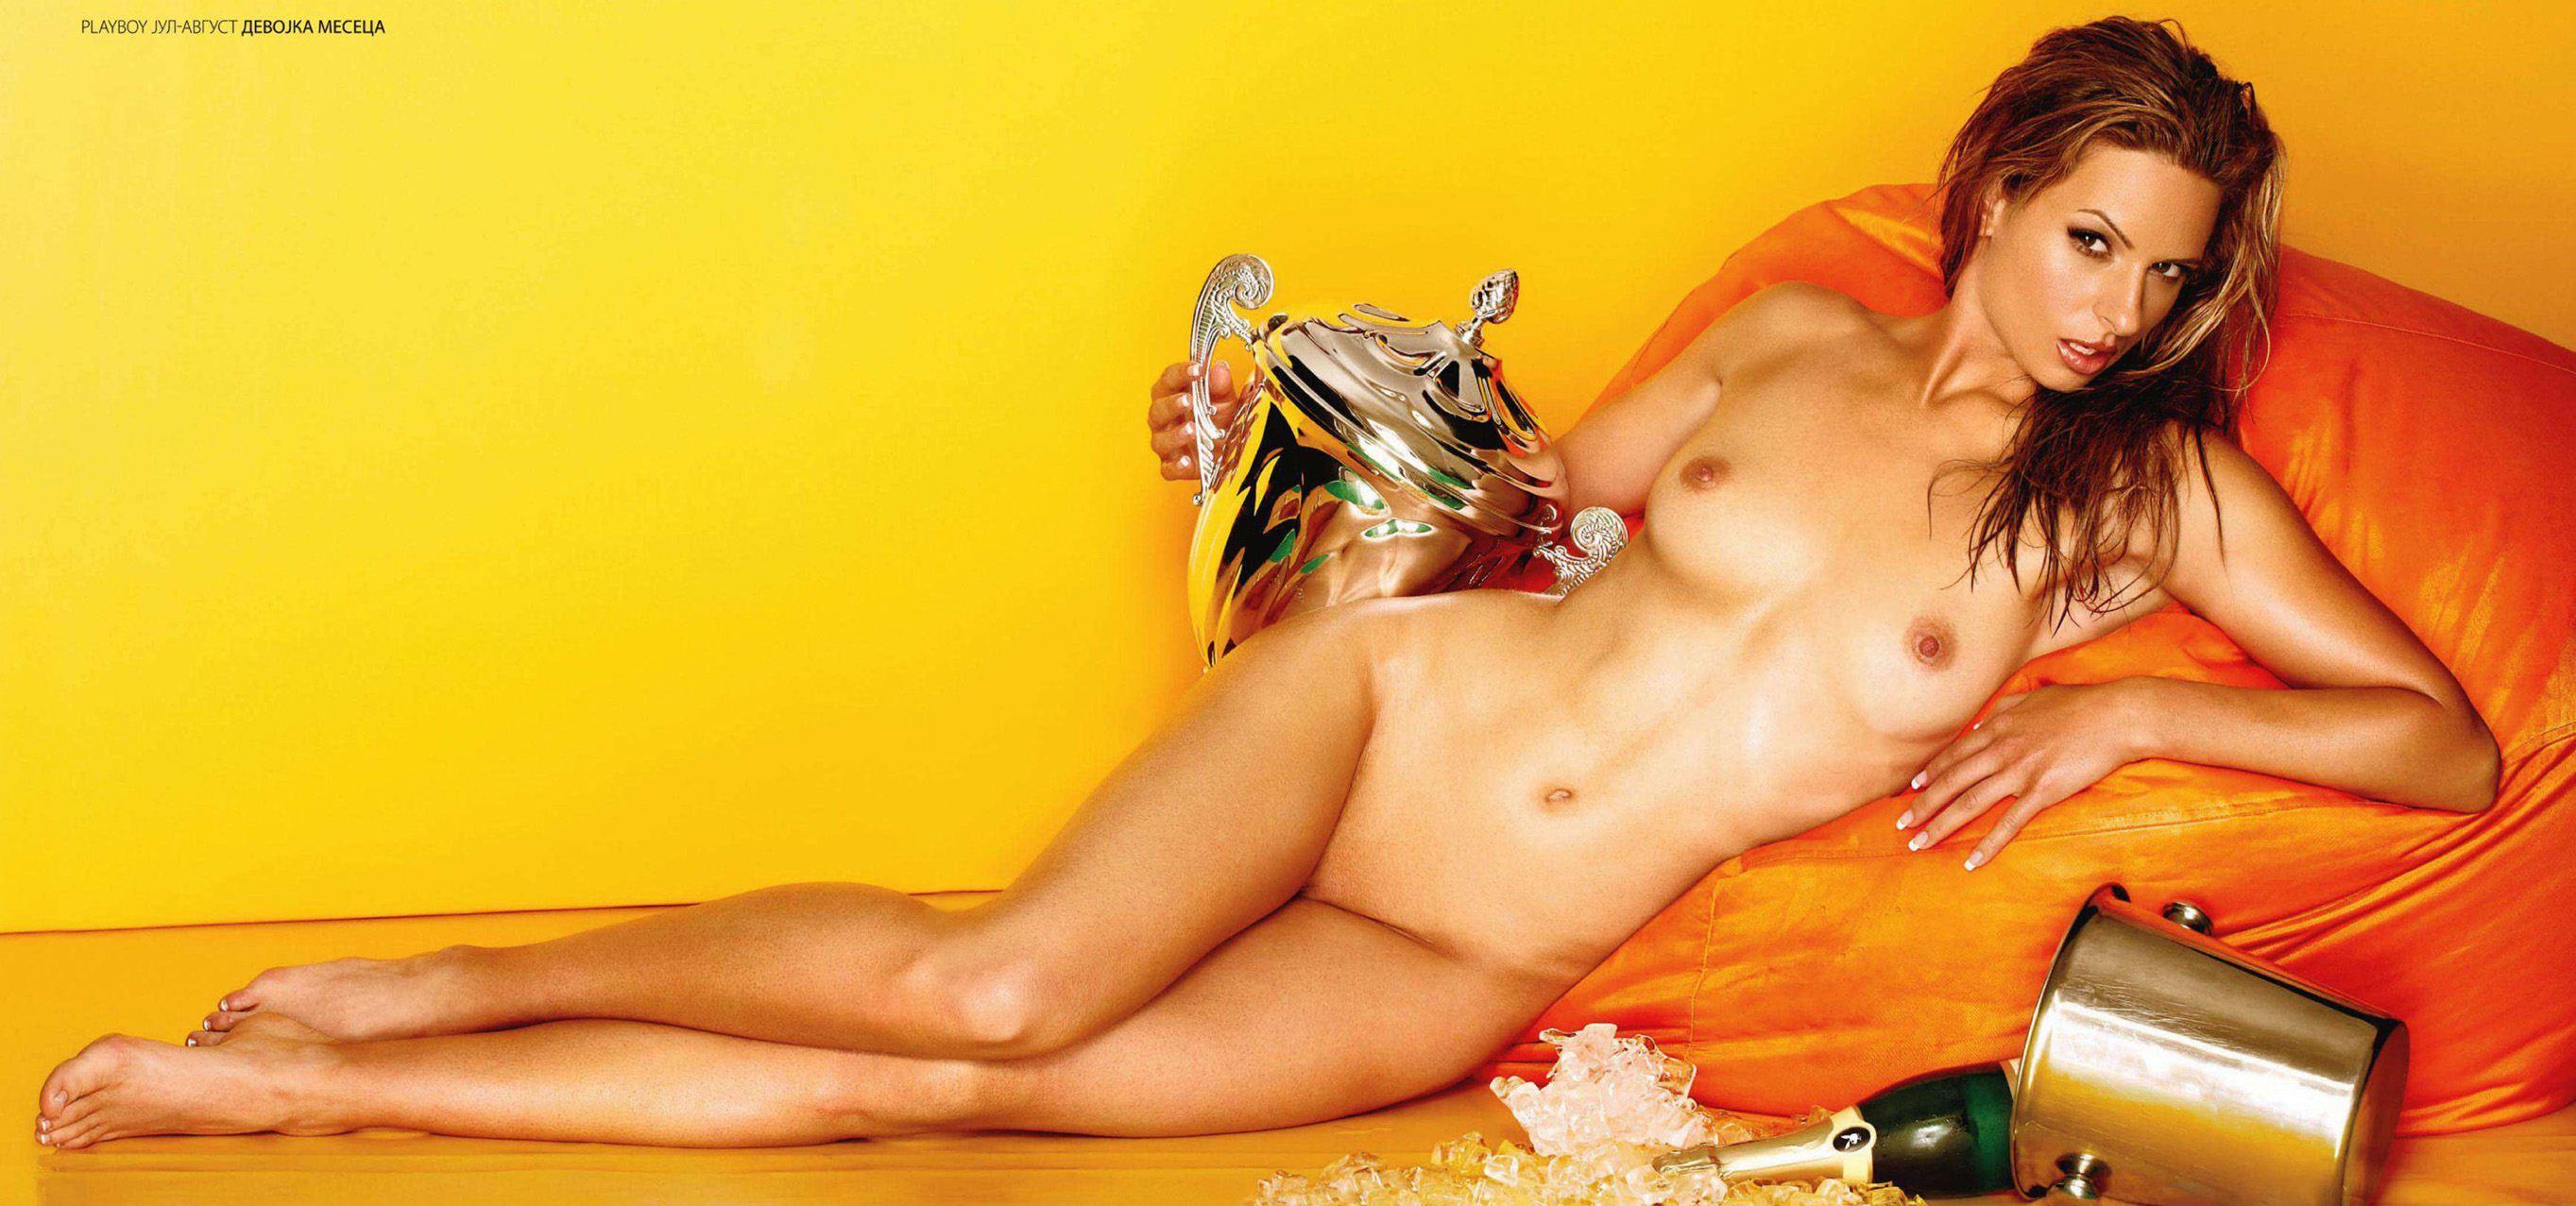 Любица Аврамович / Ljubica Avramovic in Playboy Serbia july-august 2011 - большой постер 4 мегапикселя